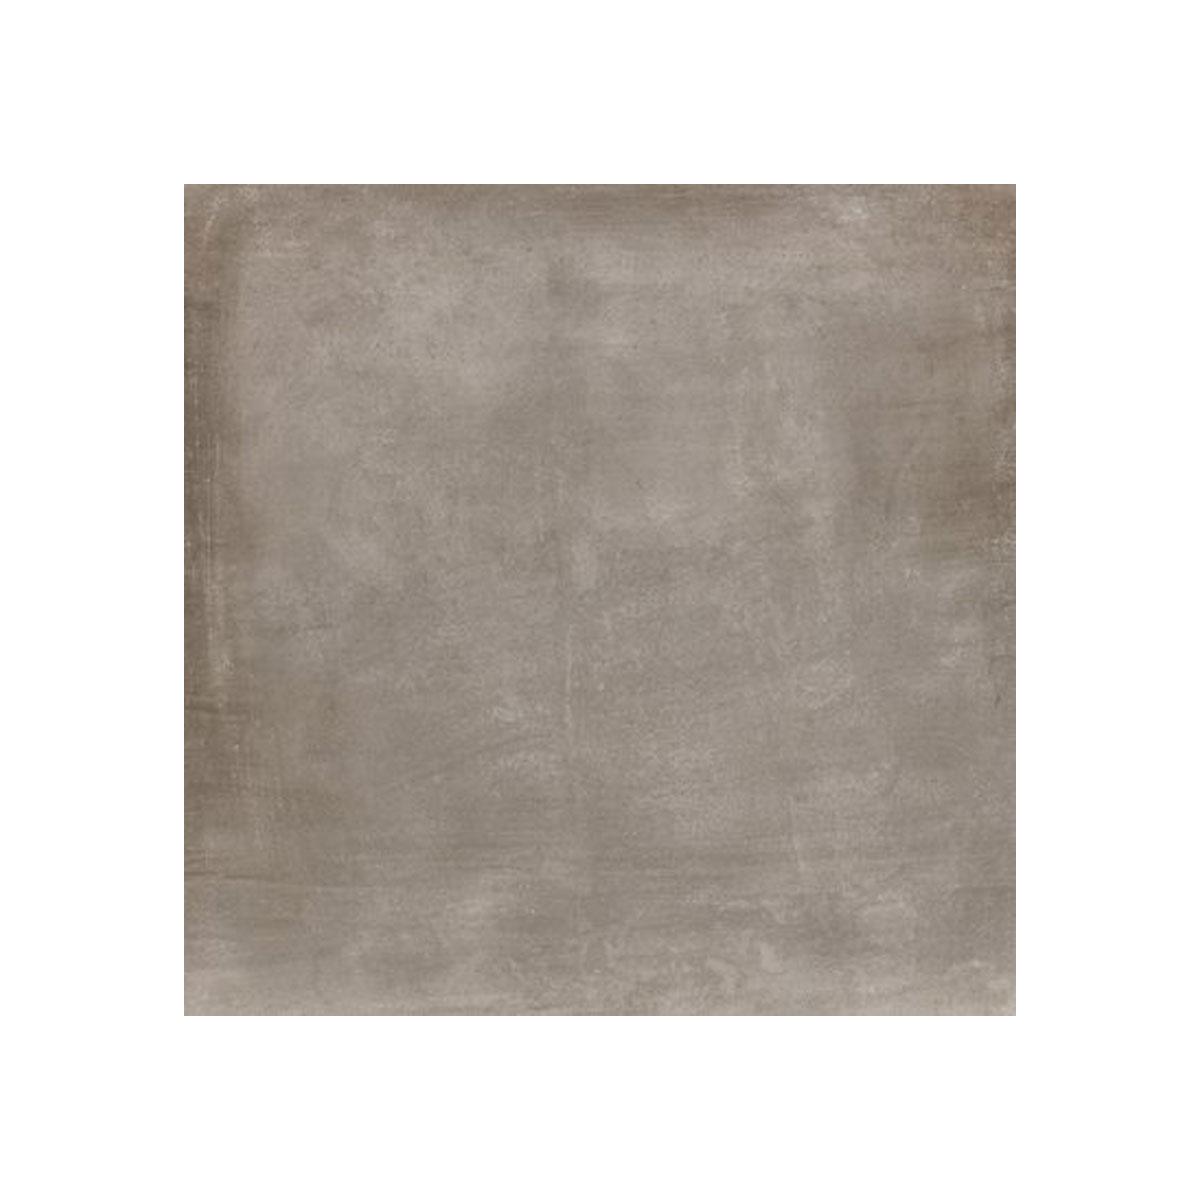 Basic Concrete - Dark Grey - 600x600mm - Concrete Look Tiles - Stone3 Brisbane